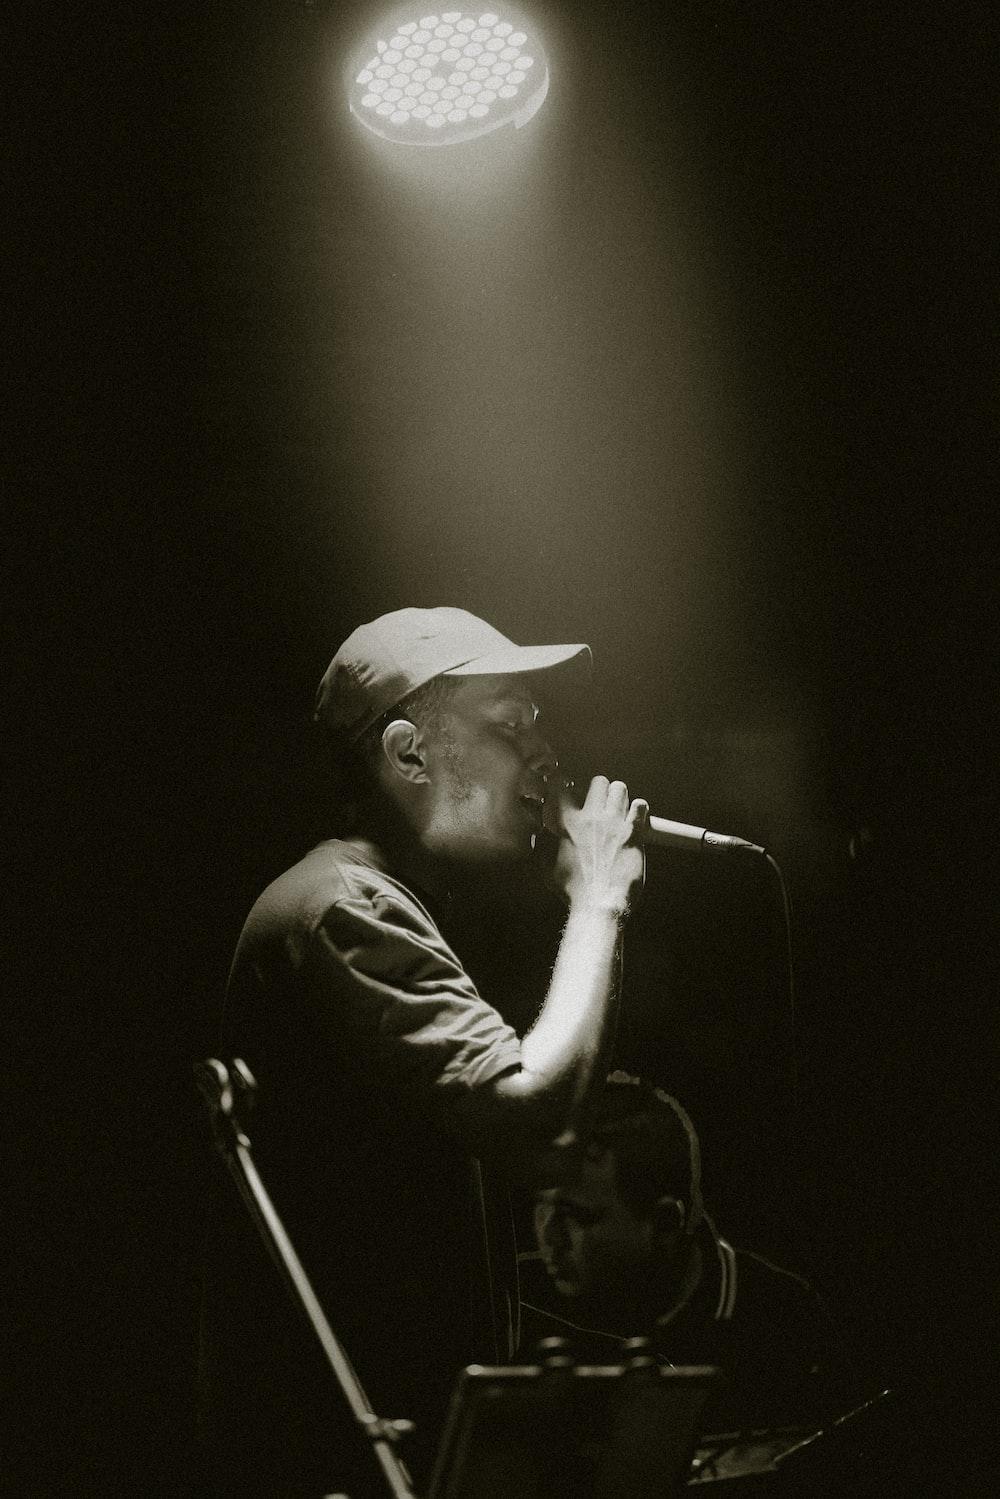 man in black hat singing